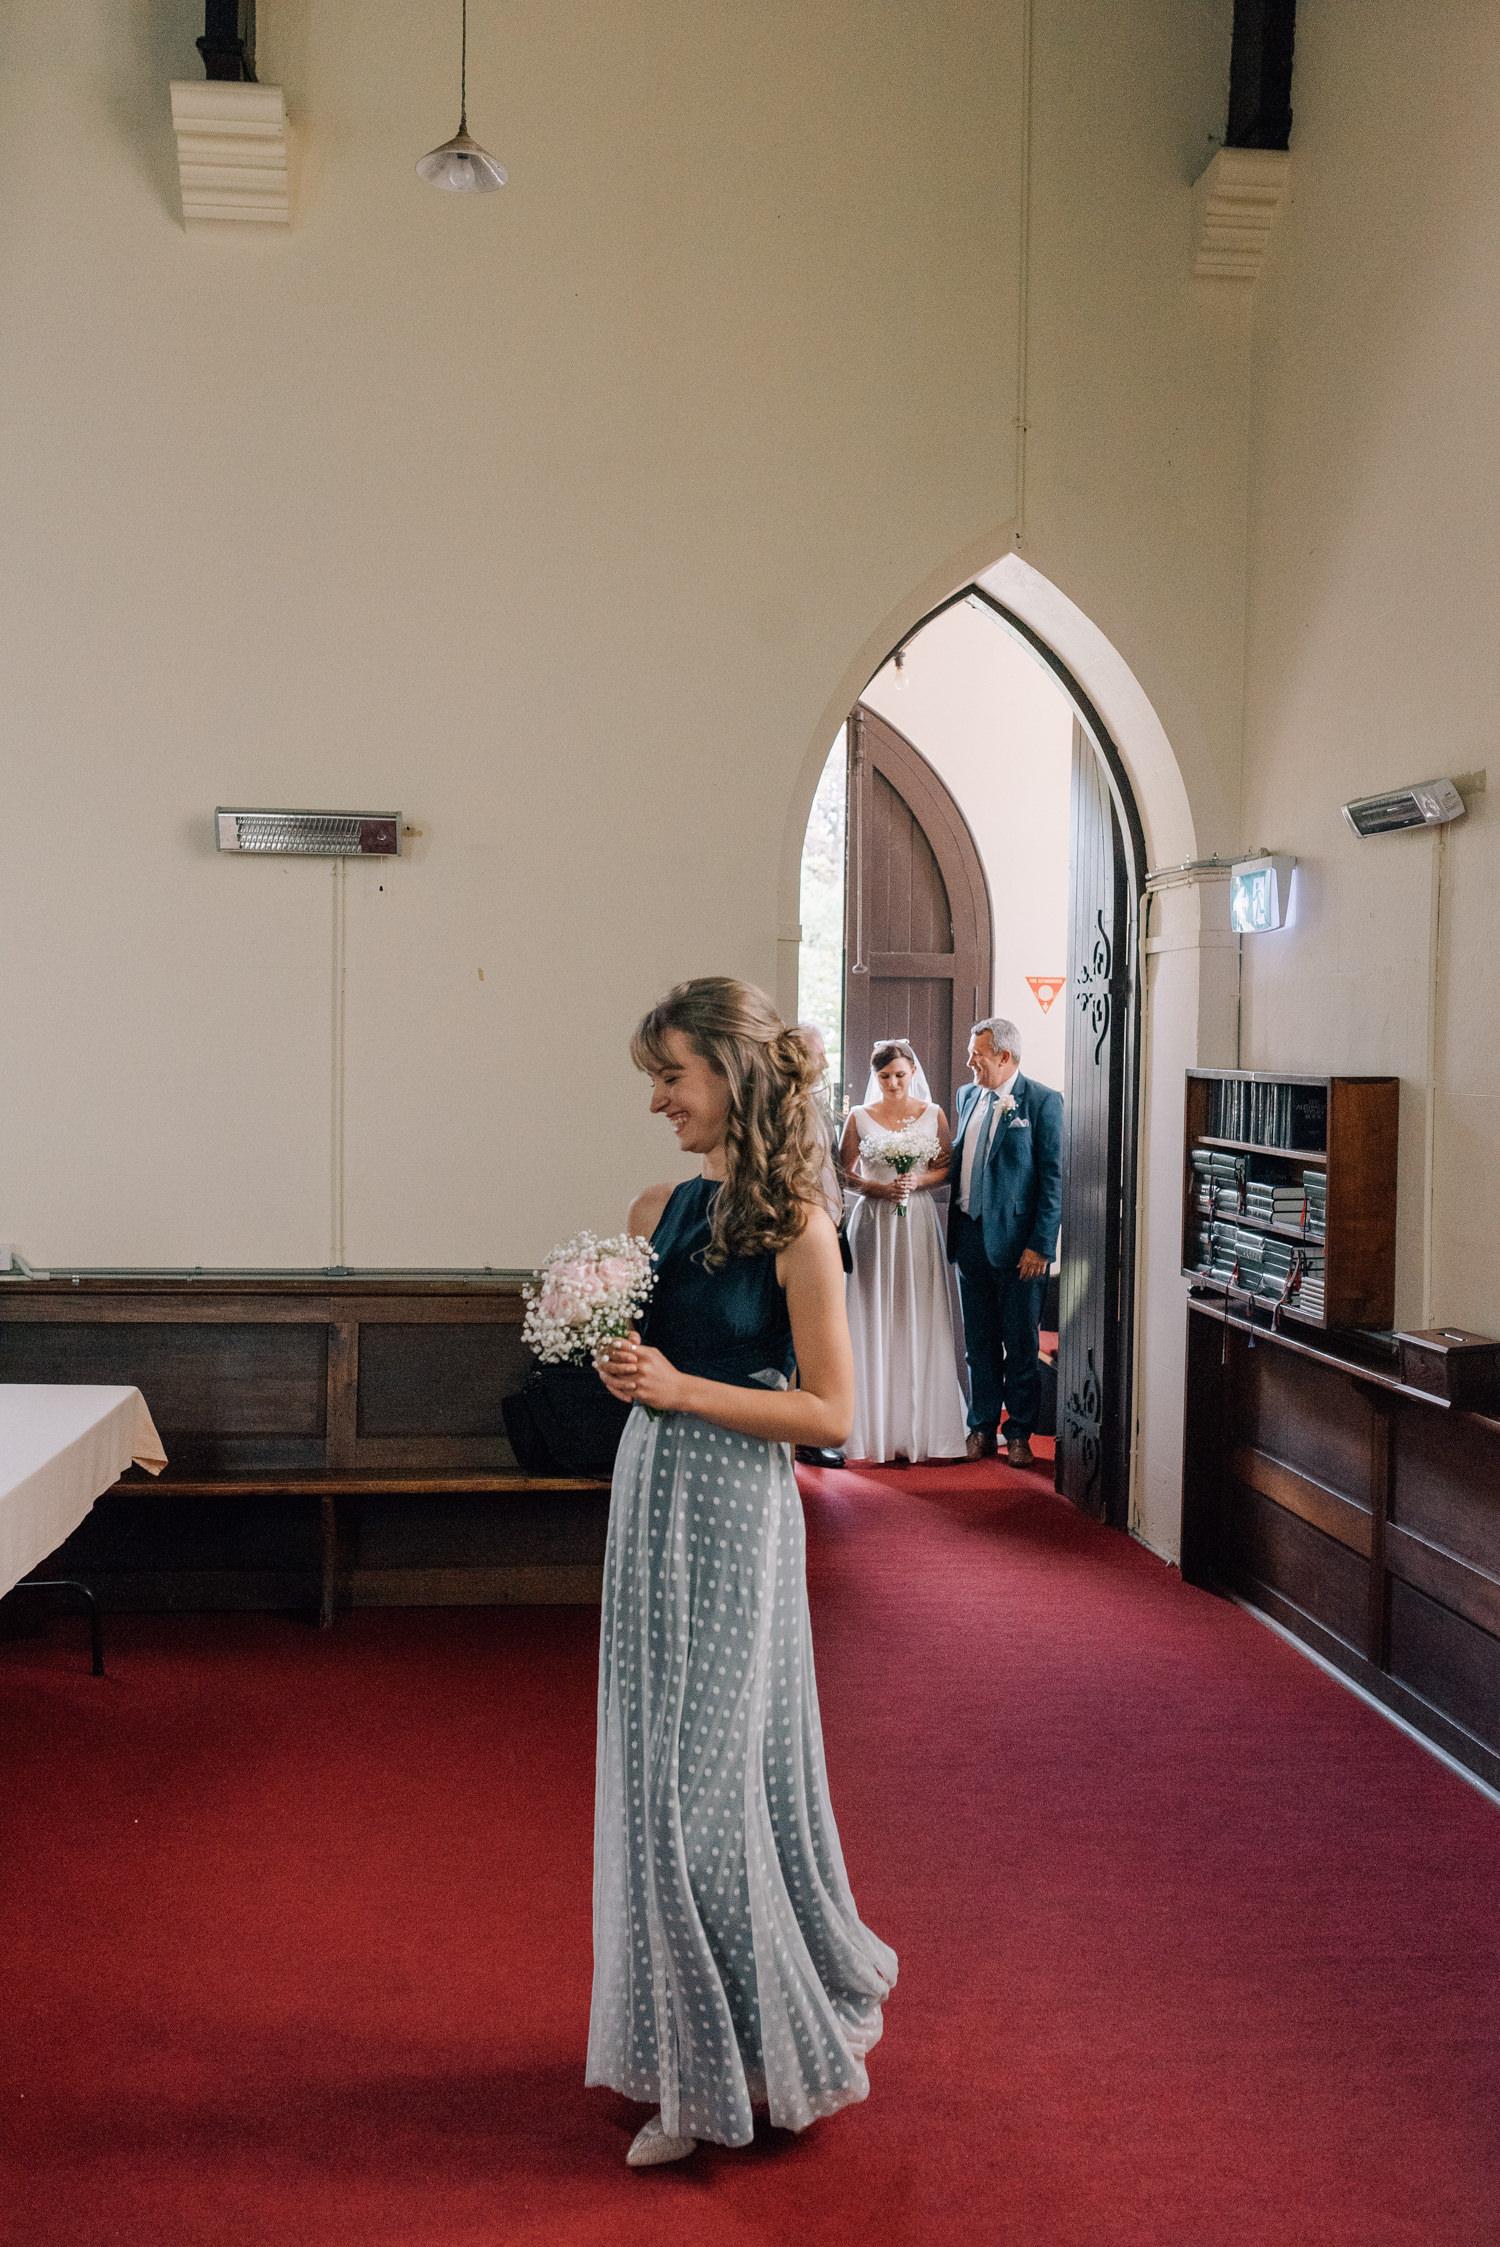 Josef-Chromy-Wedding-Photographer-17.jpg